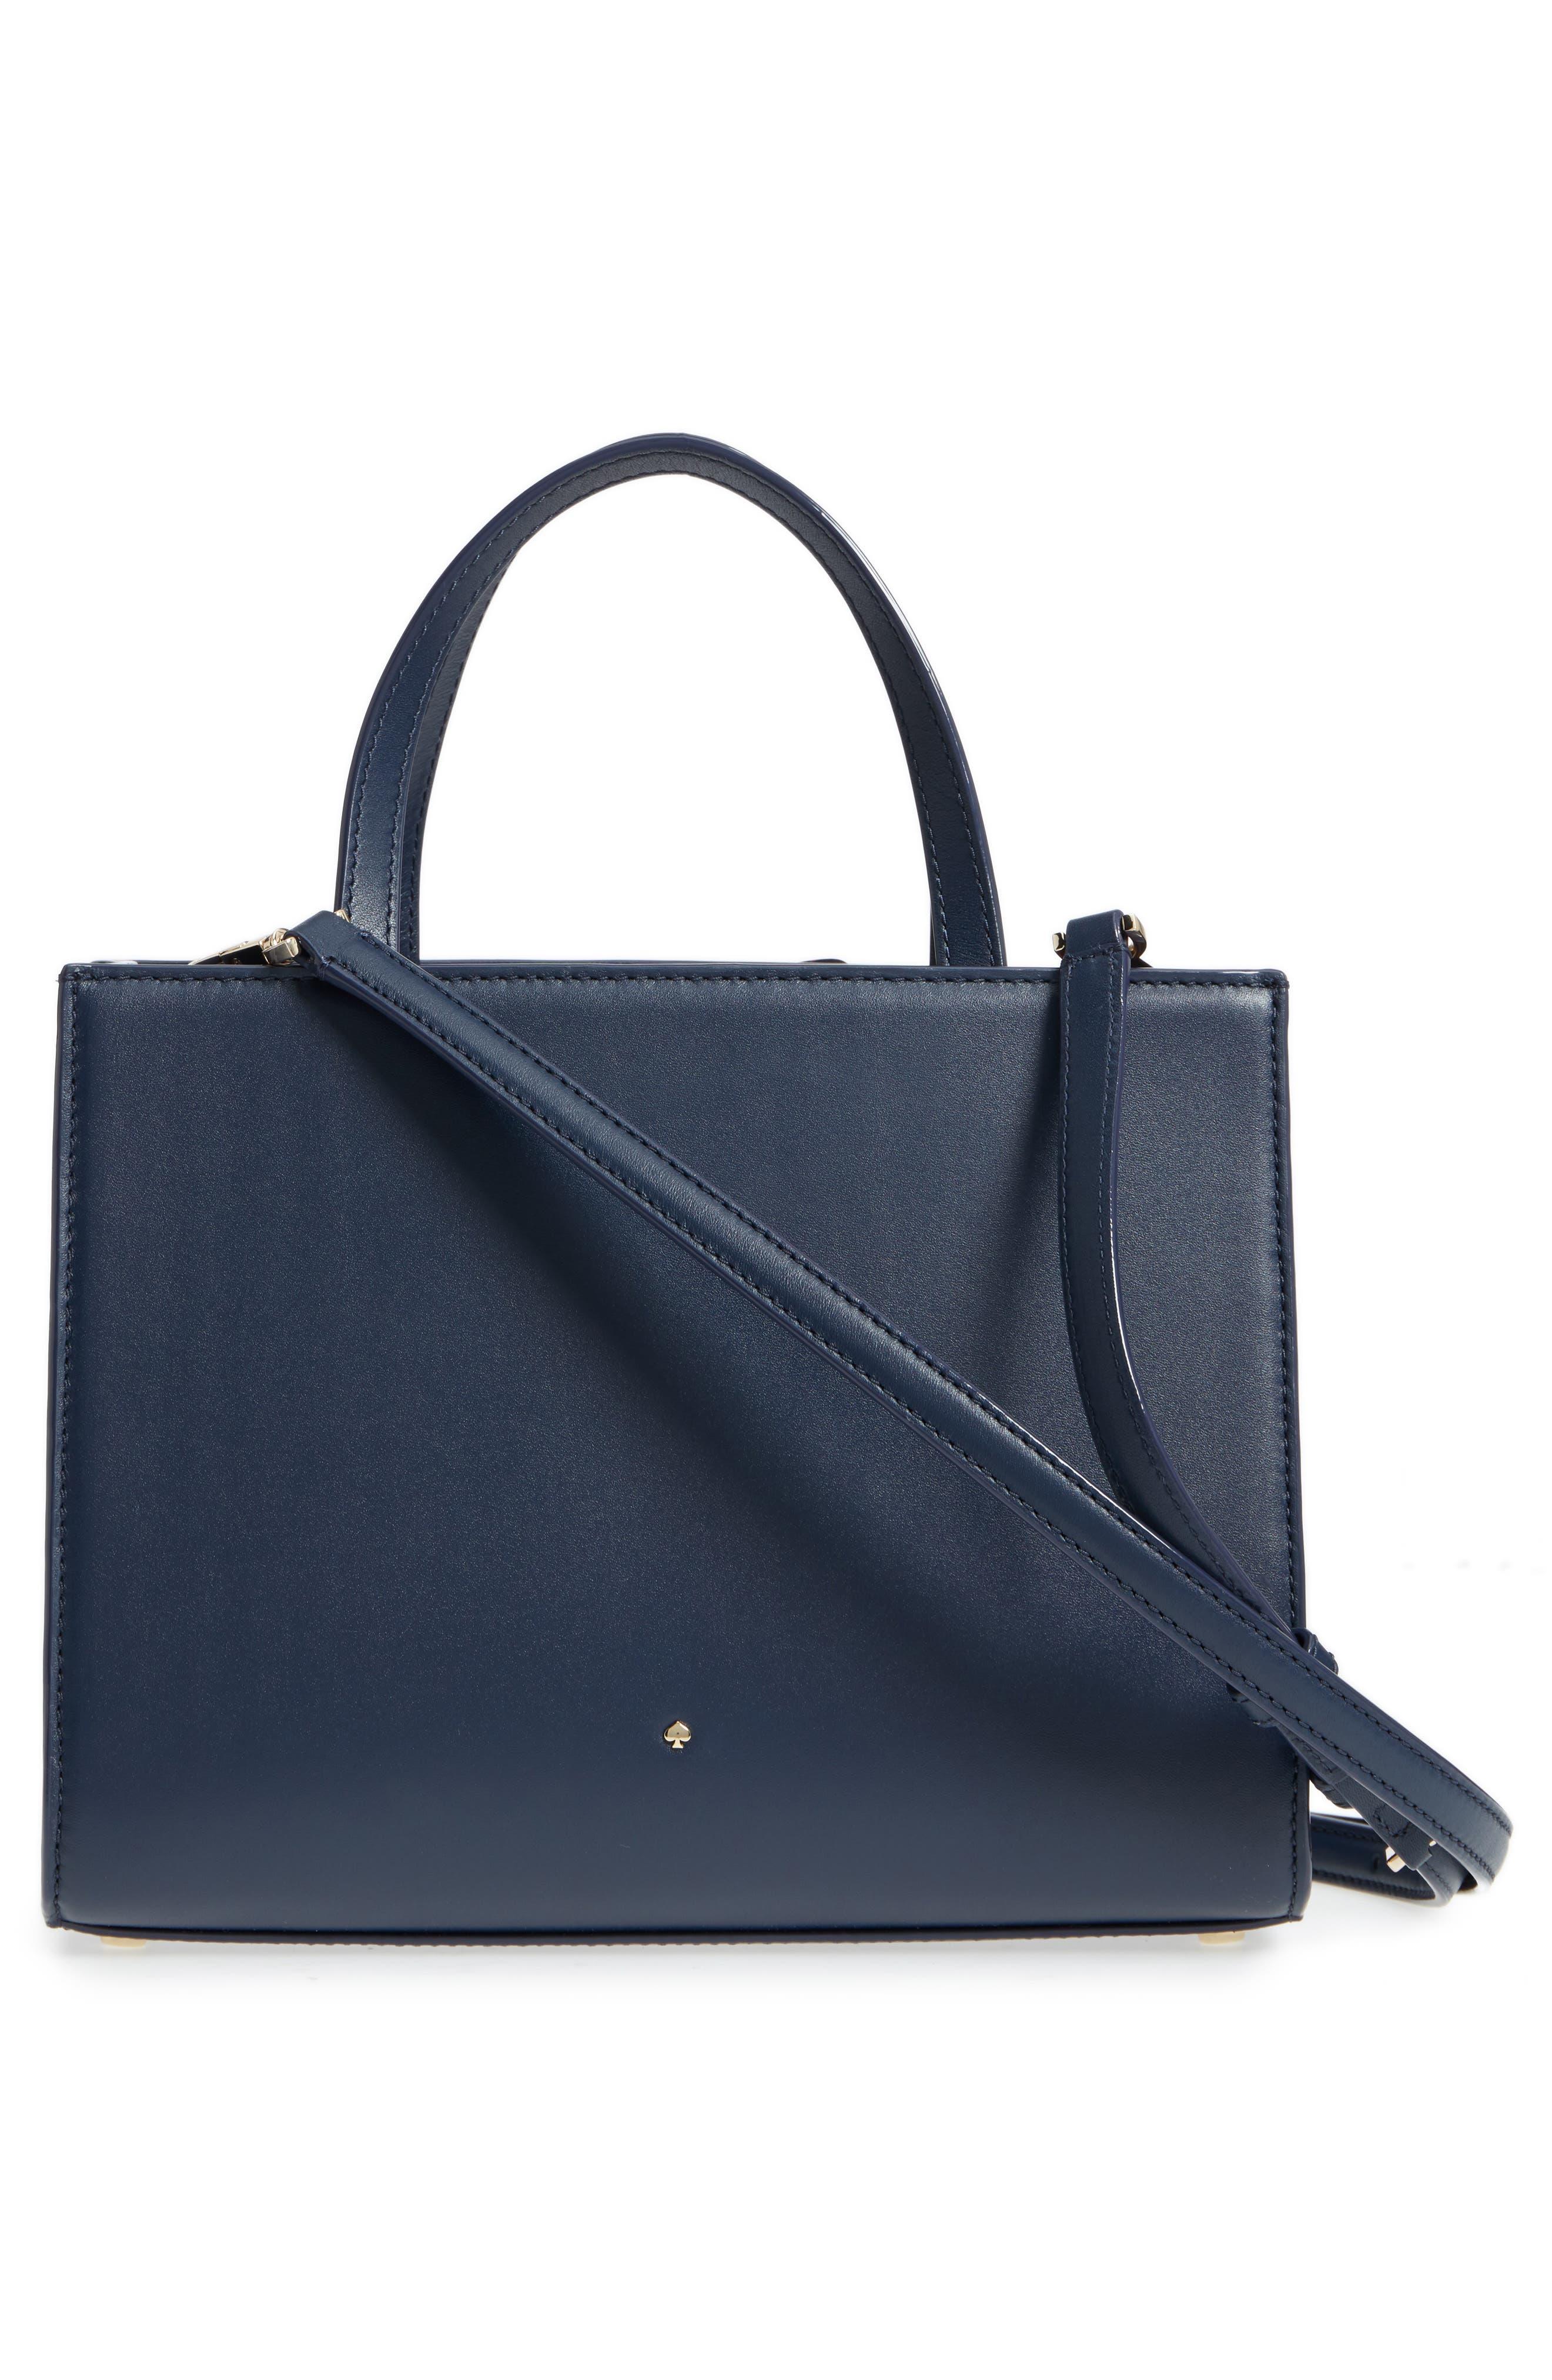 madison daisy lane – sam leather handbag,                             Alternate thumbnail 3, color,                             Blazer Blue Multi